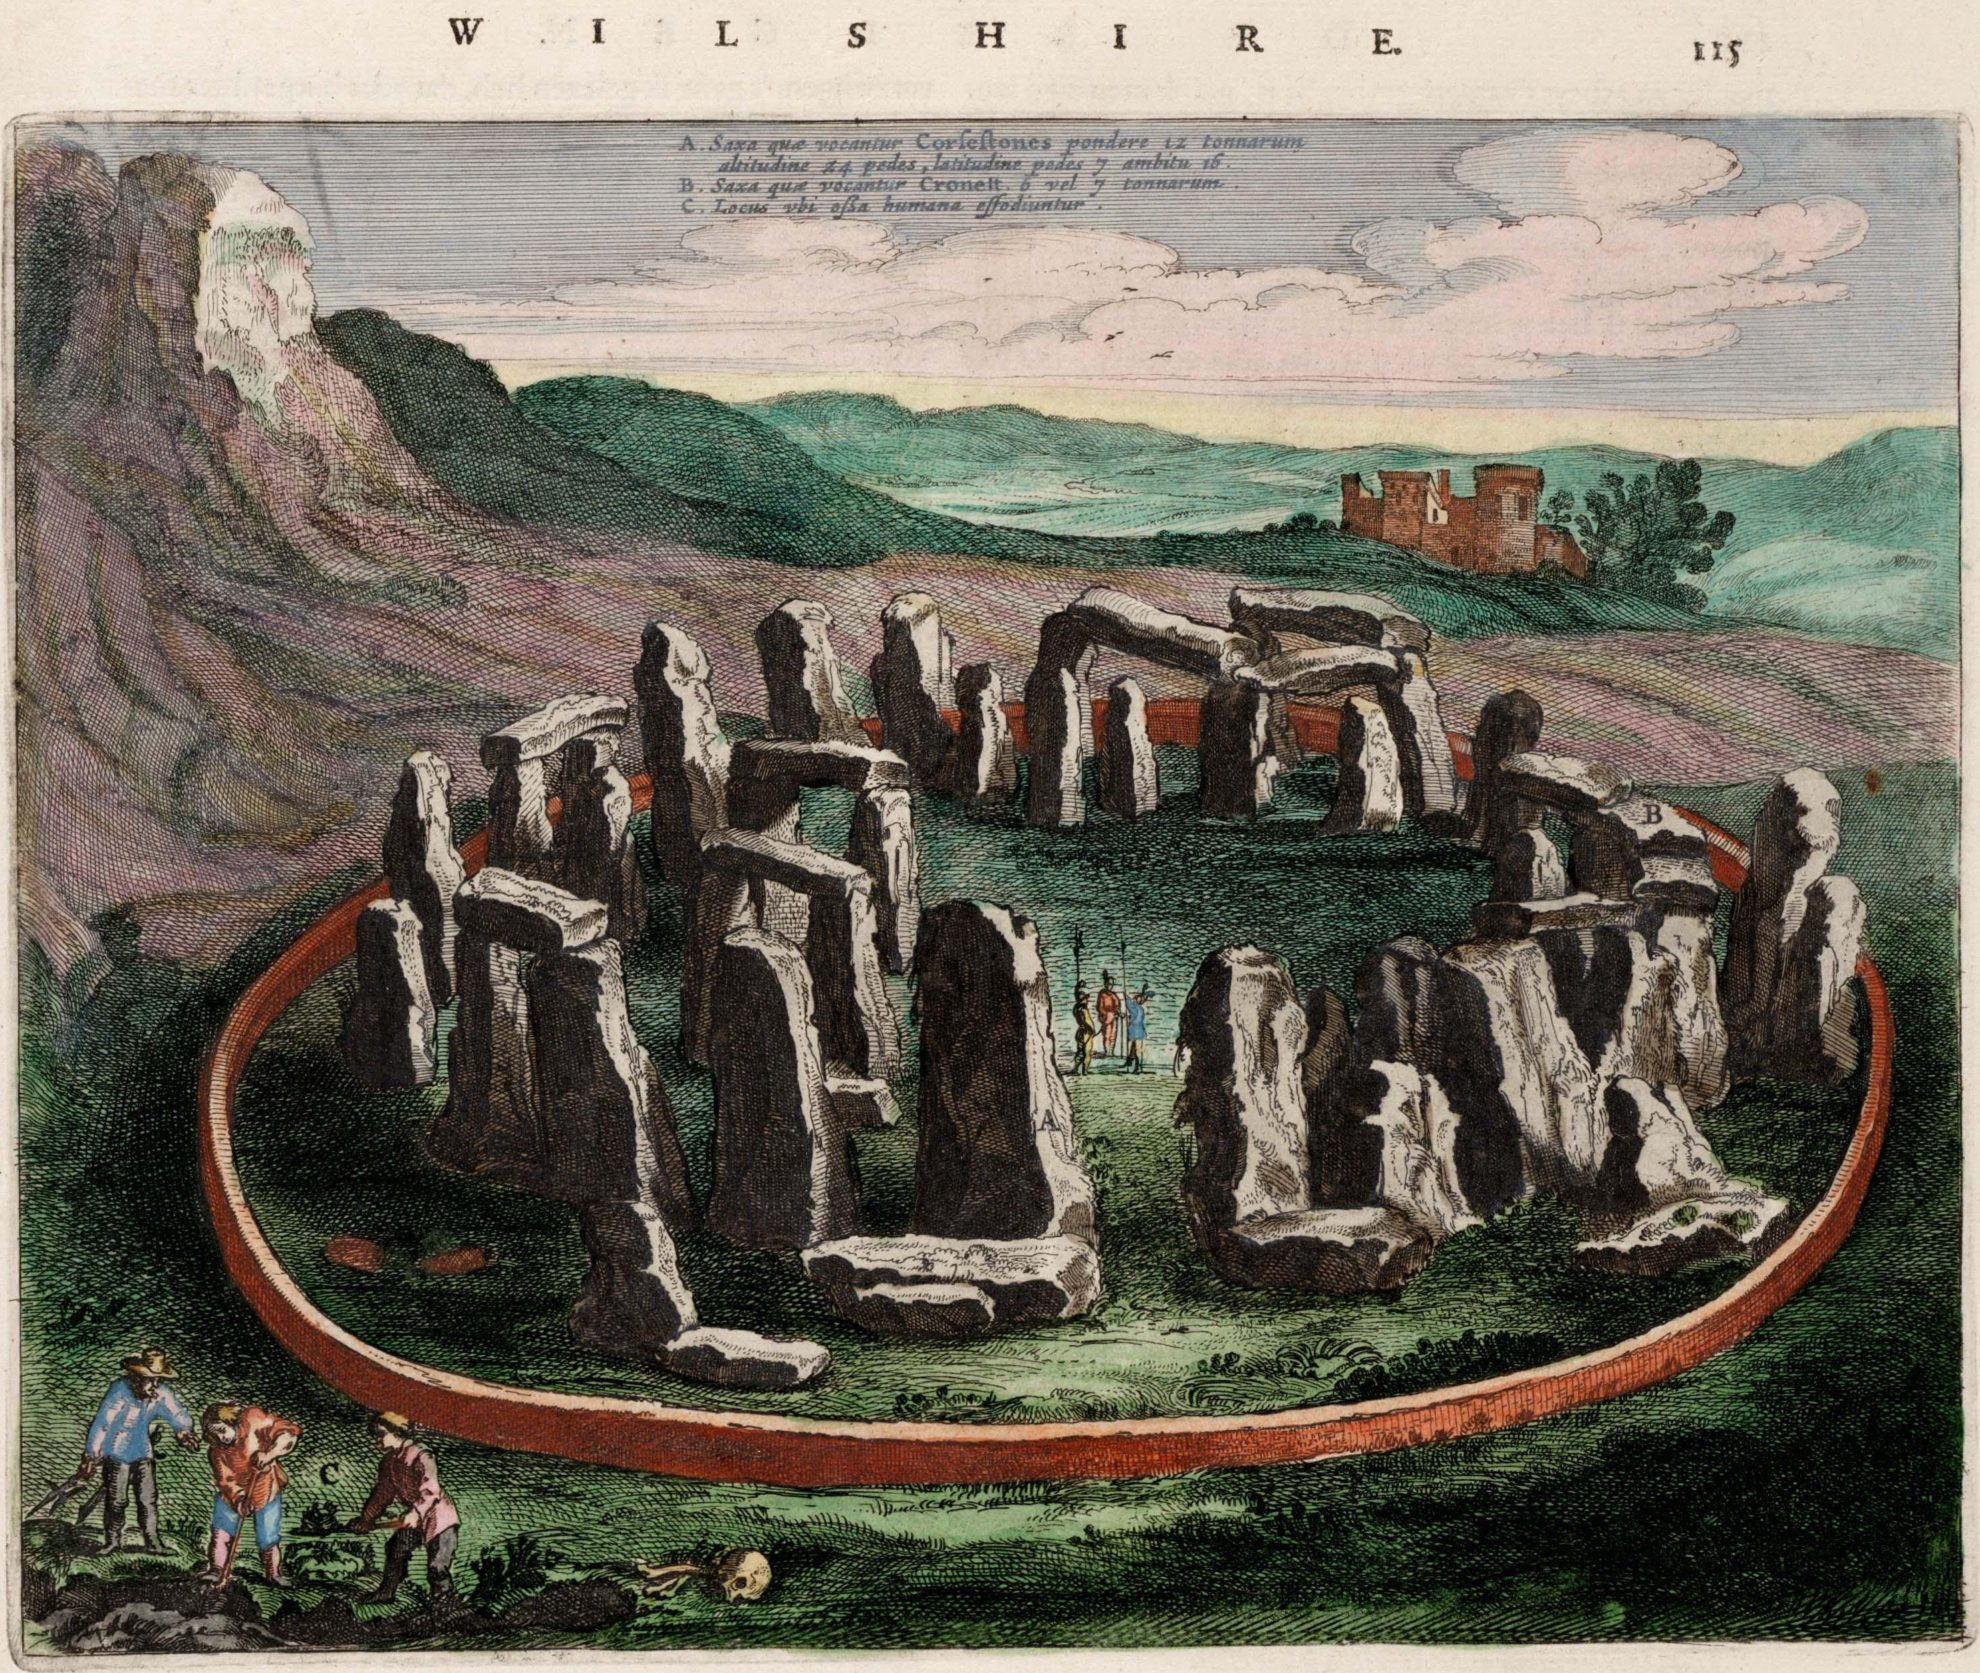 stonehenge_-_wiltonia_sive_comitatus_wiltoniensis-_anglice_wilshire_-atlas_van_loon